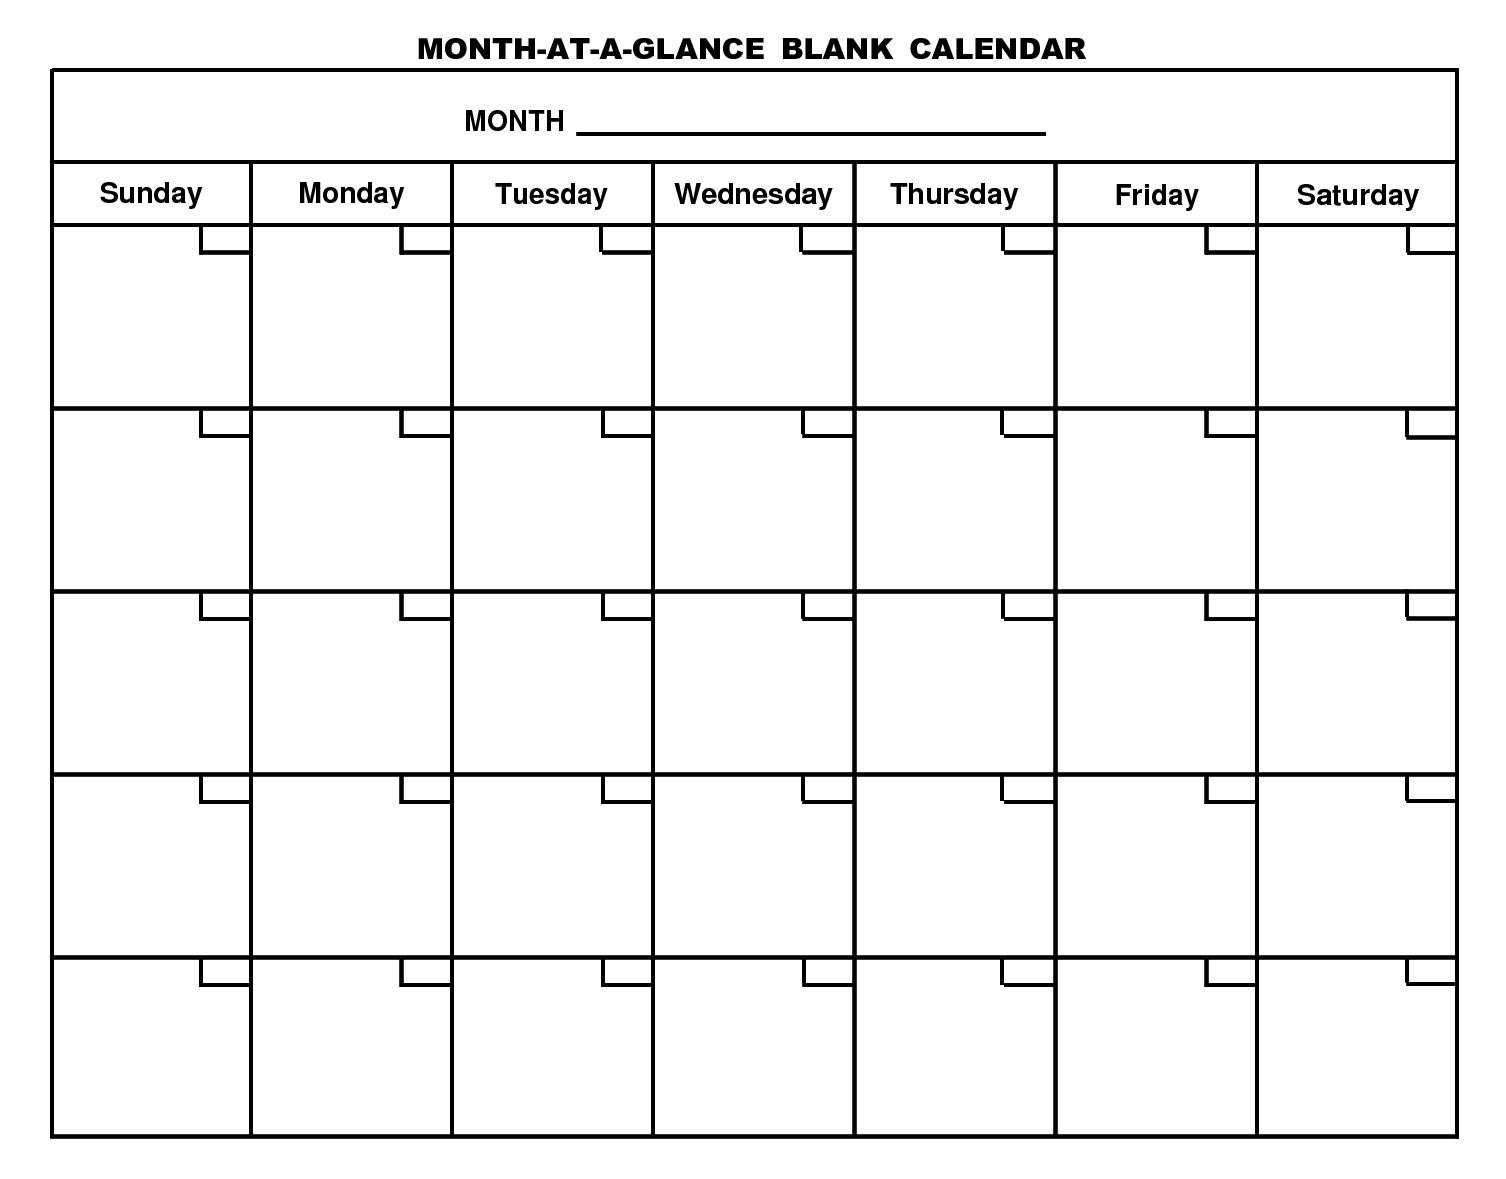 Month Blank Calendar - Erha.yasamayolver